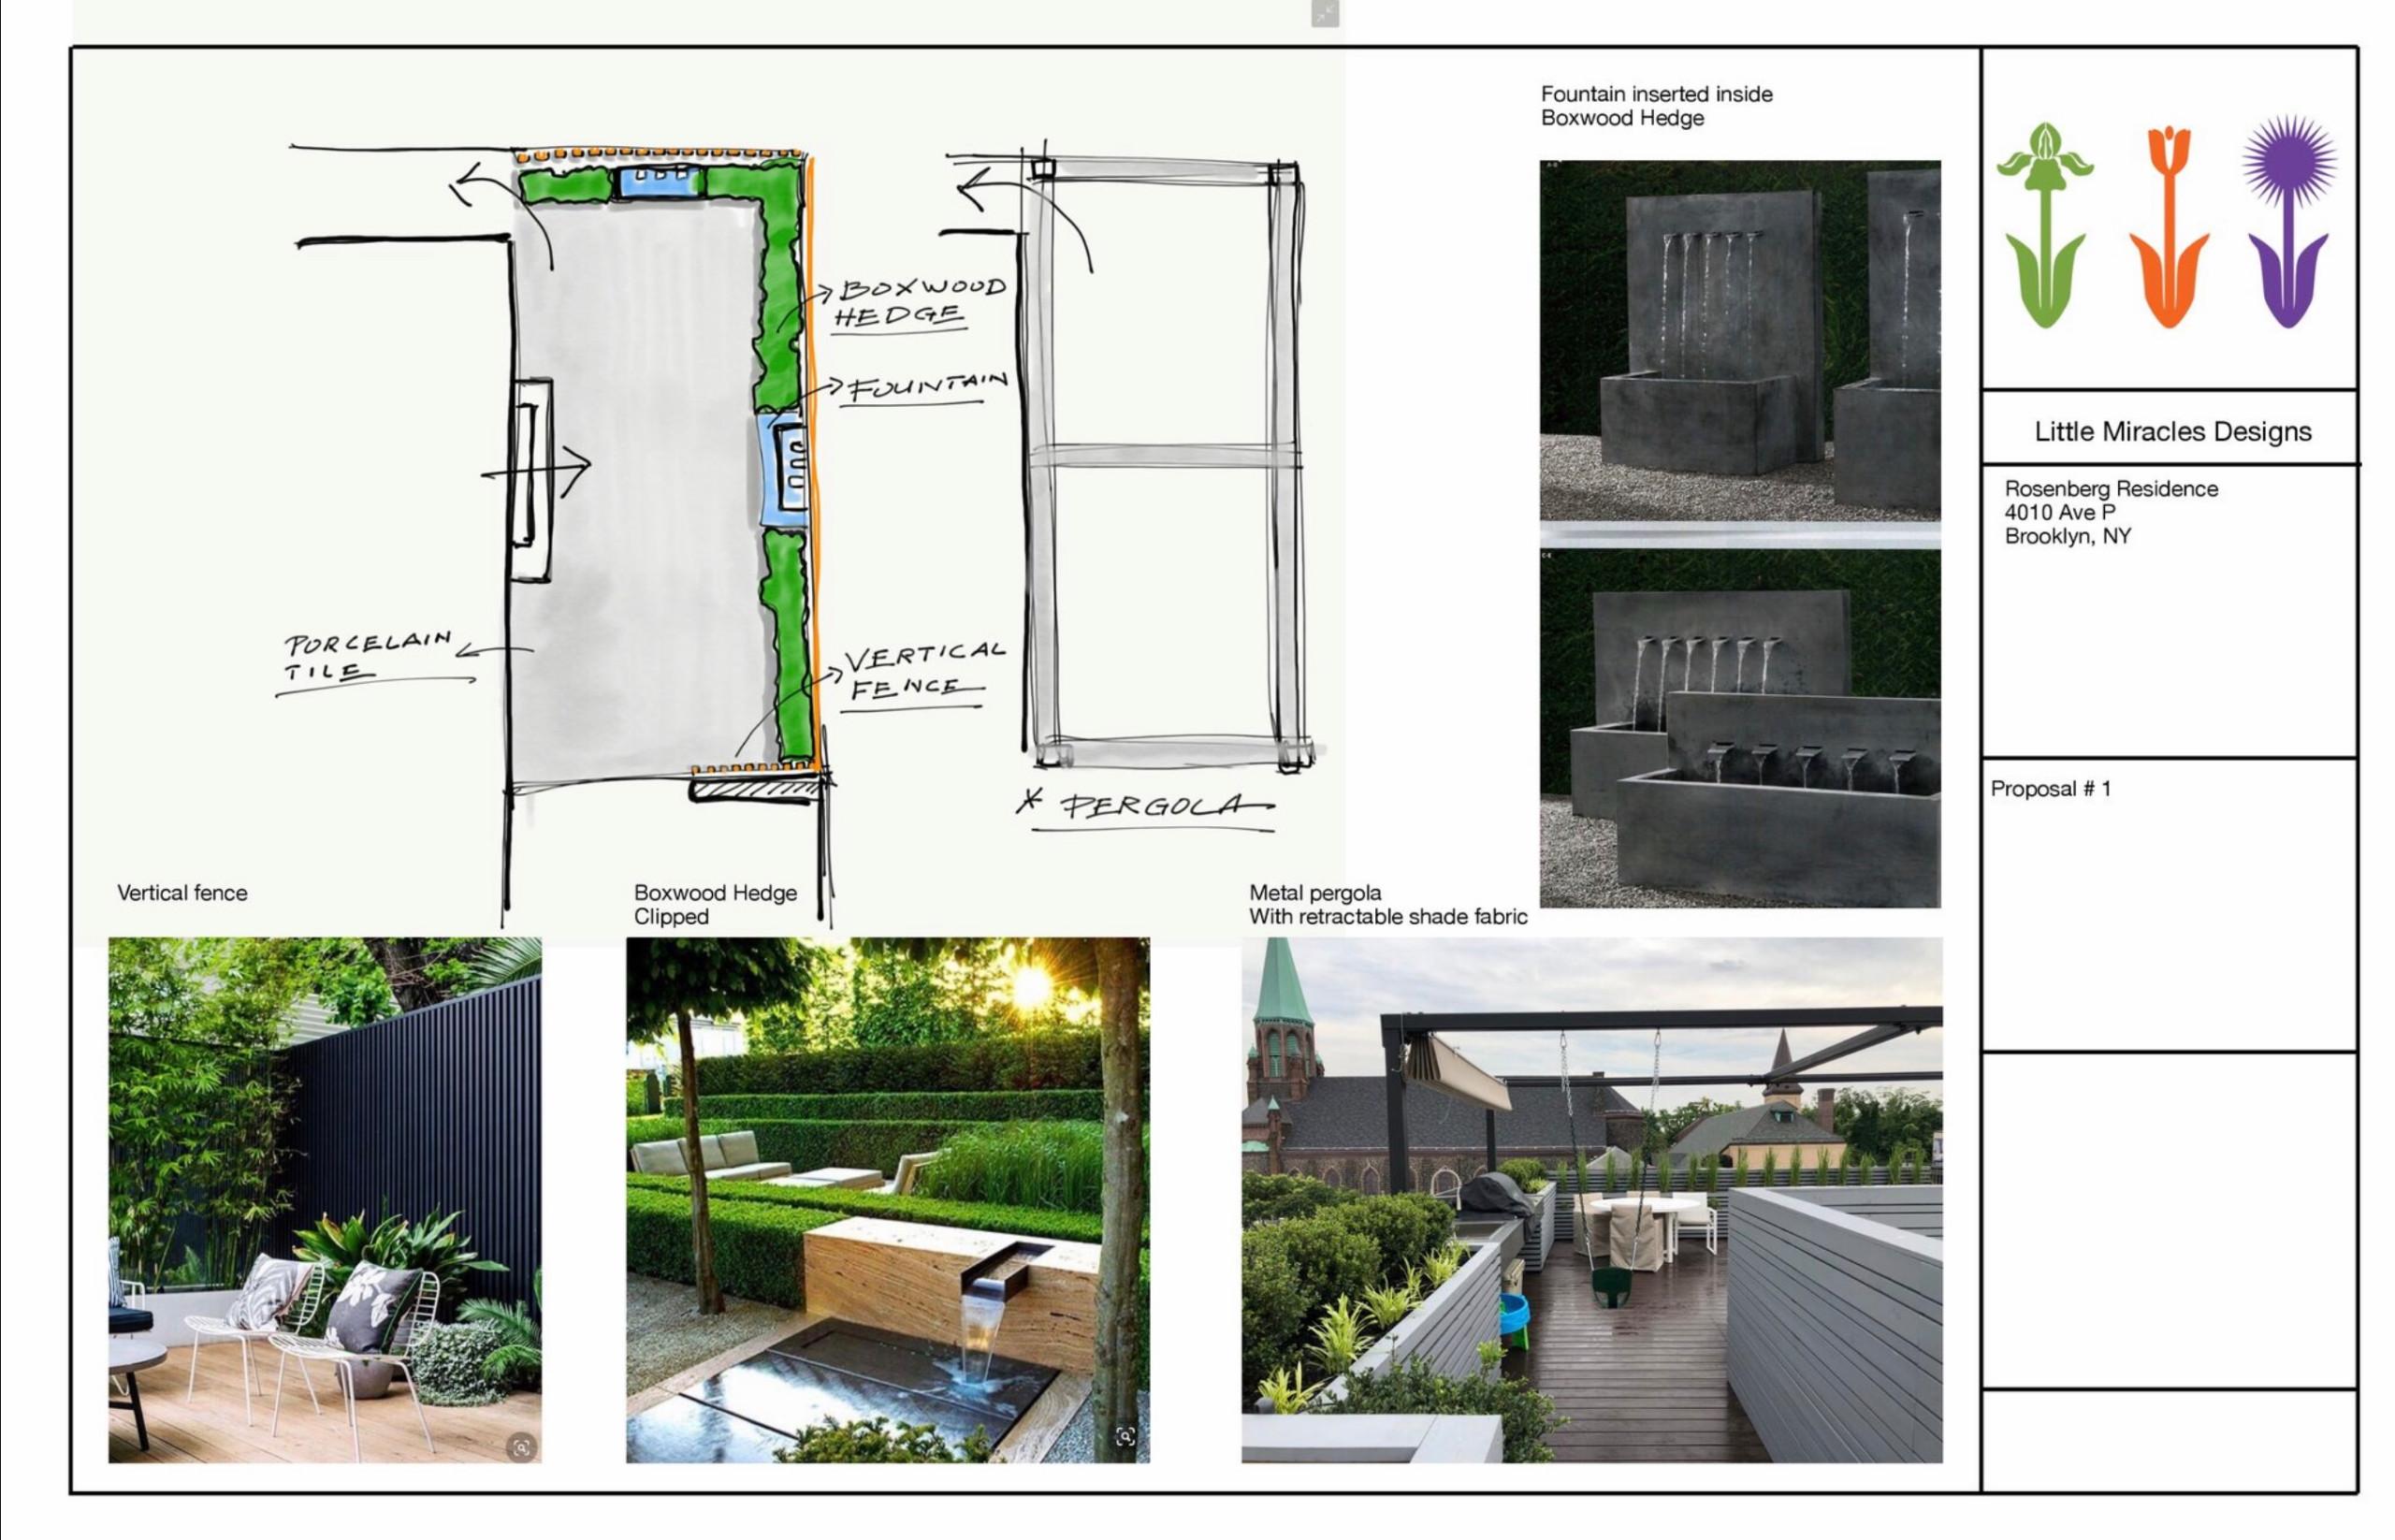 Presentation with details